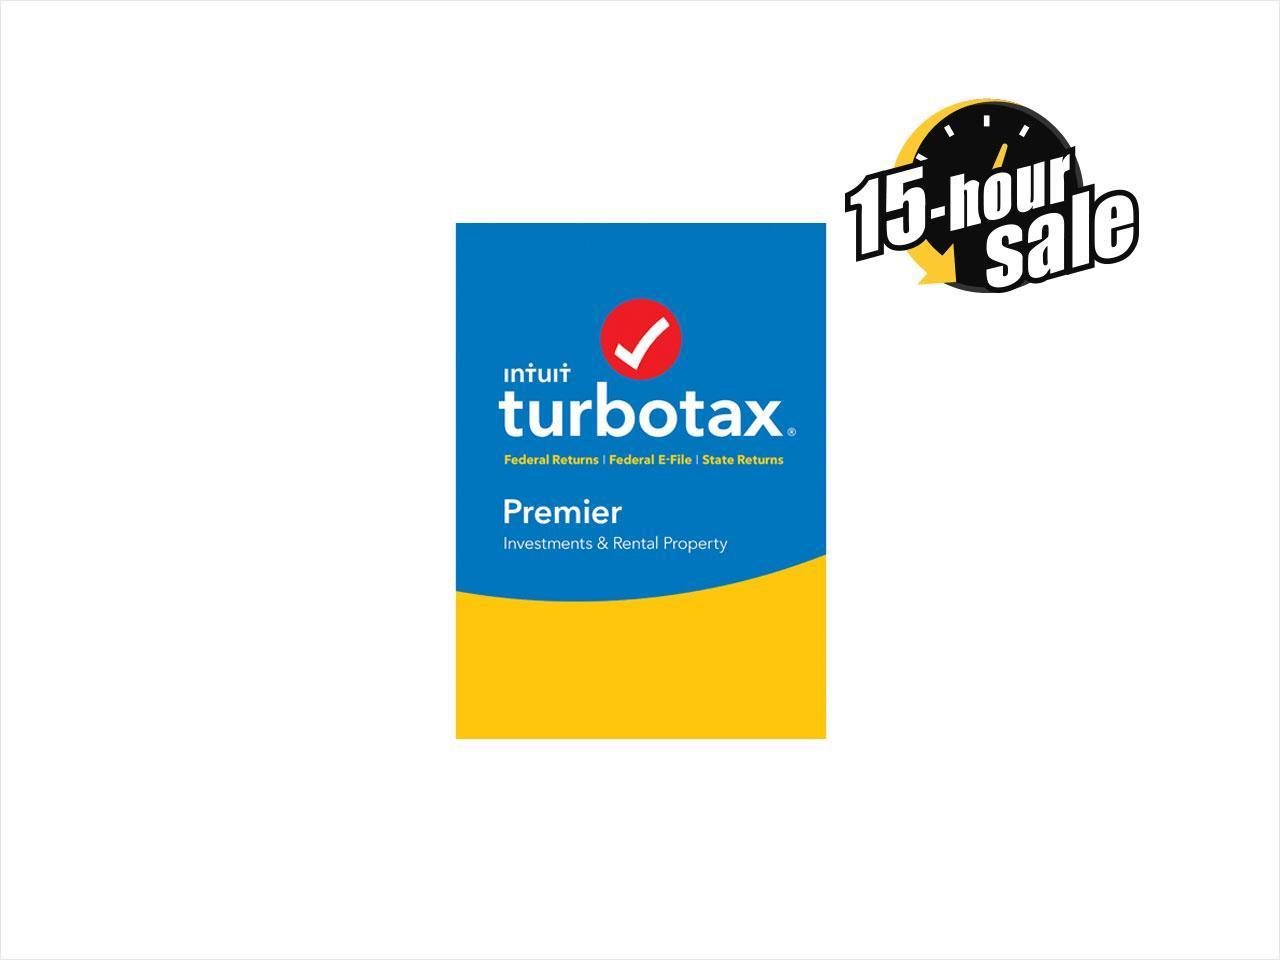 Buy Best turbotax requiring drivers license in massachusetts